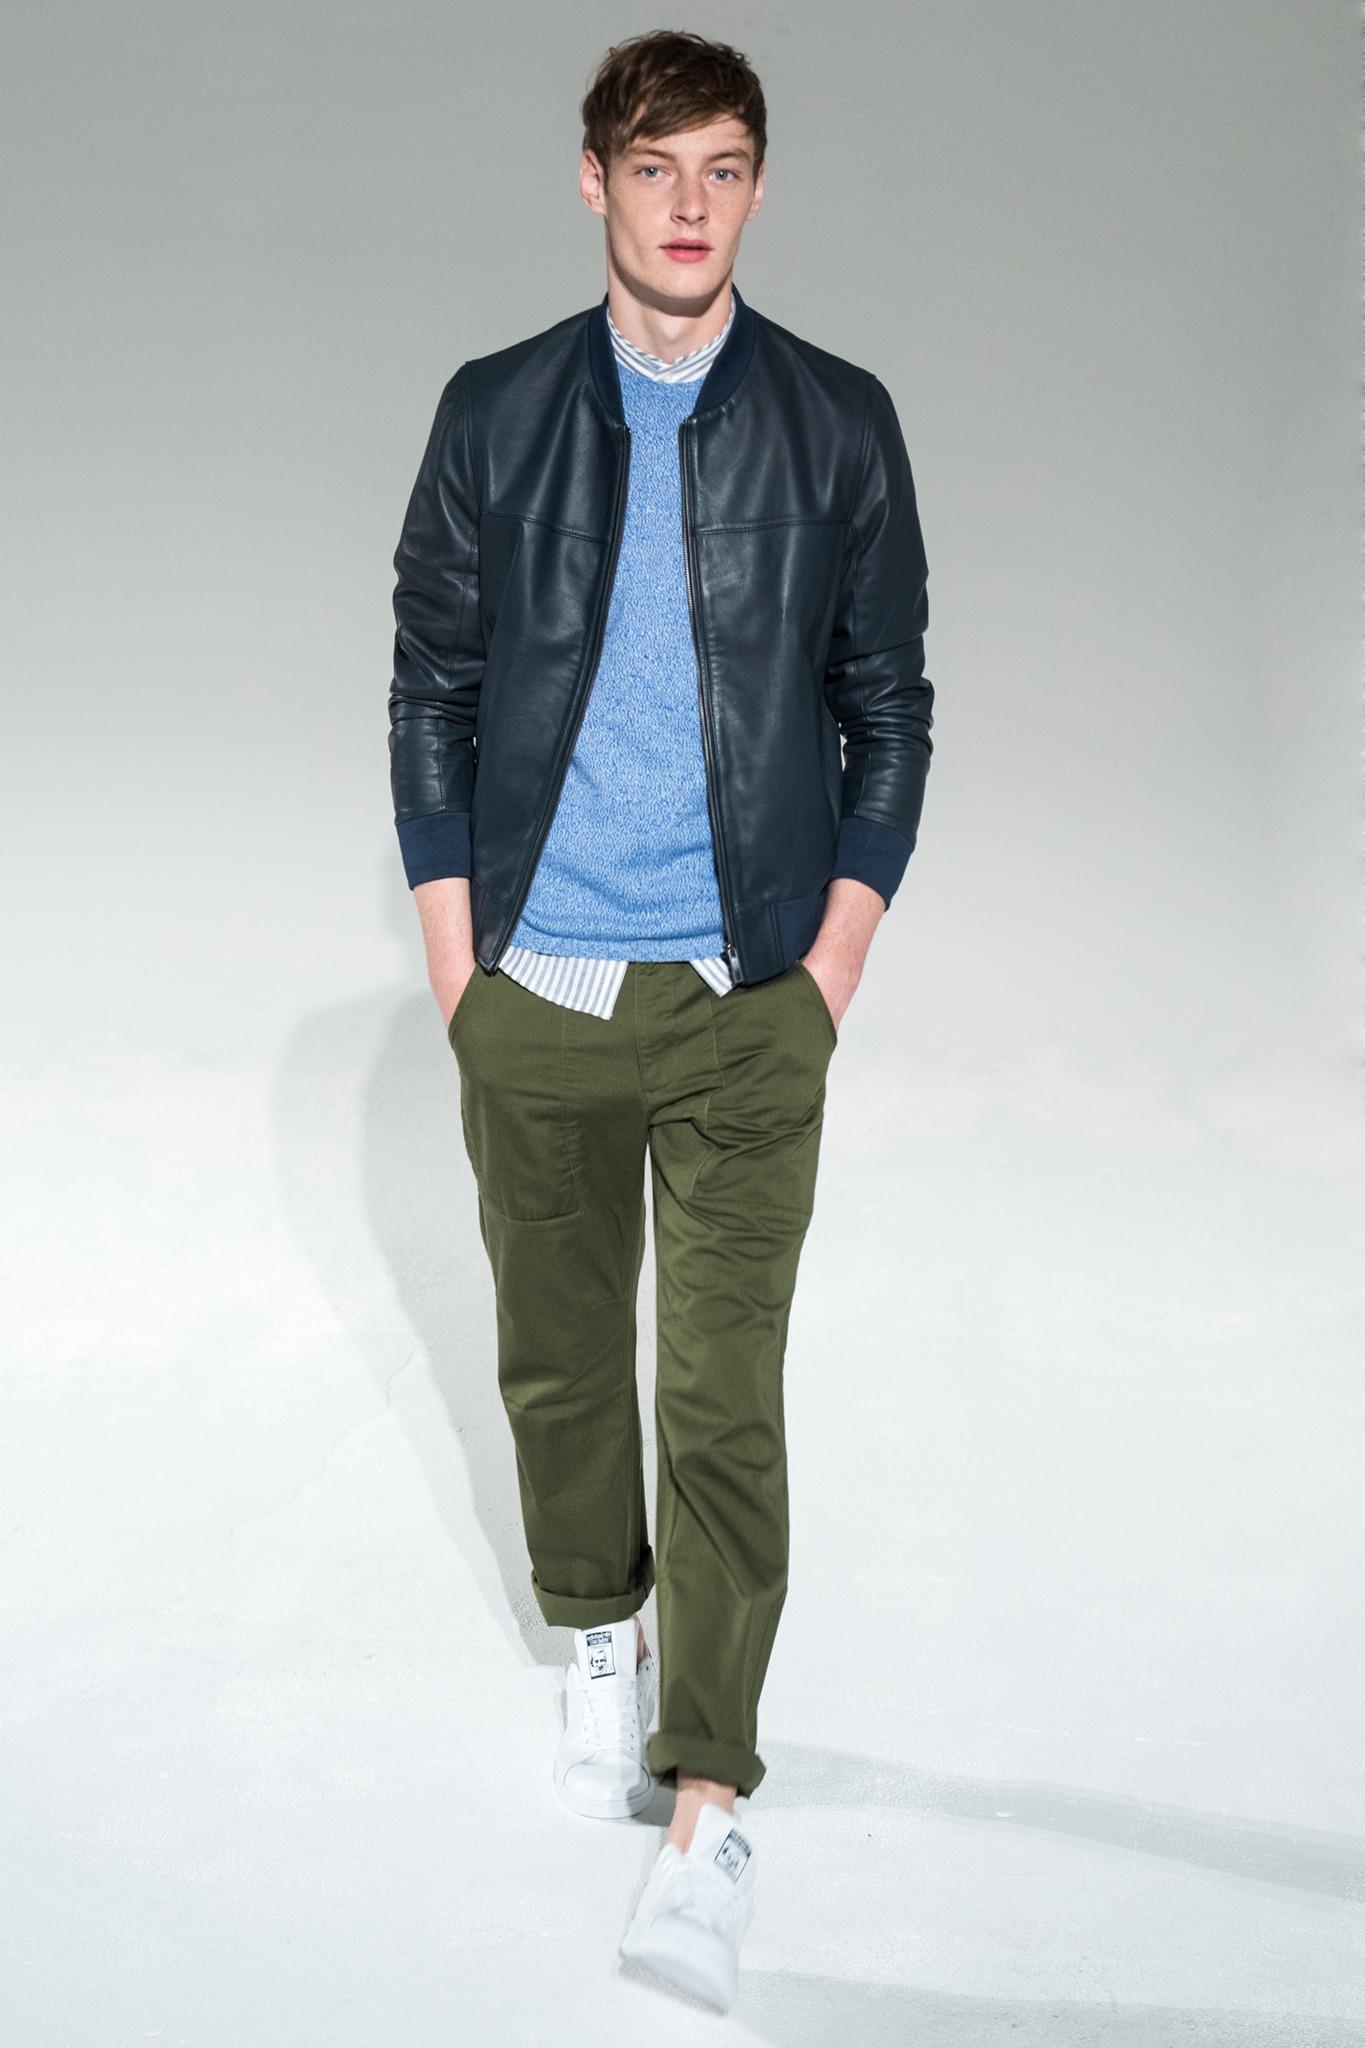 Daniel Hechter Men's Fashion For Spring And Summer 2018